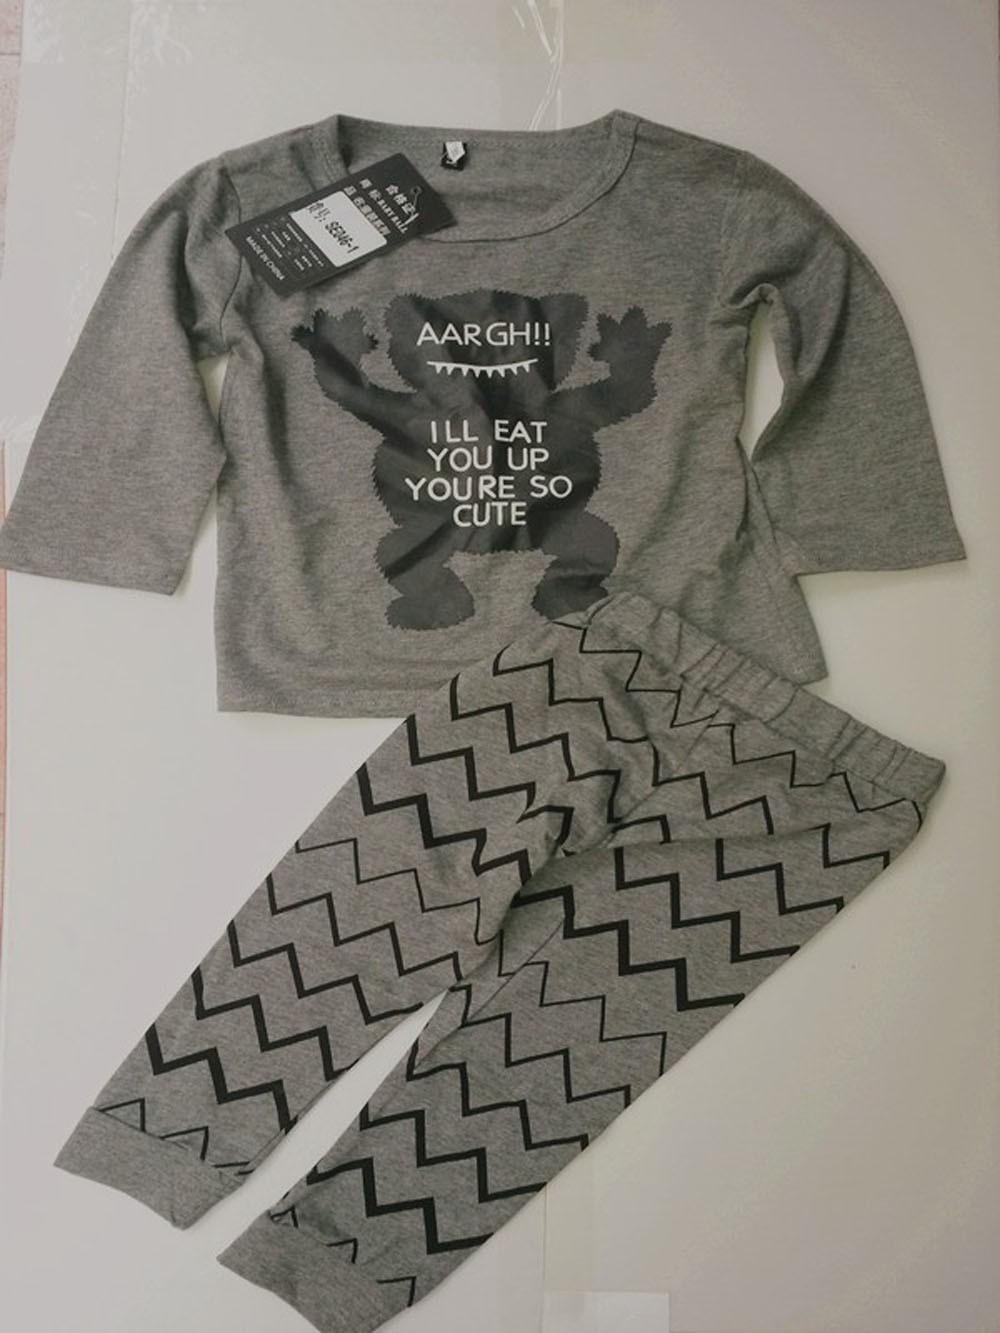 2015-New-Autumn-Baby-Cotton-Little-Monster-Clothes-2pcs-Top+Pants-Sport-Suits-Infant-Boys-And-Girls-Clothing-Sets-CL0769 (21)